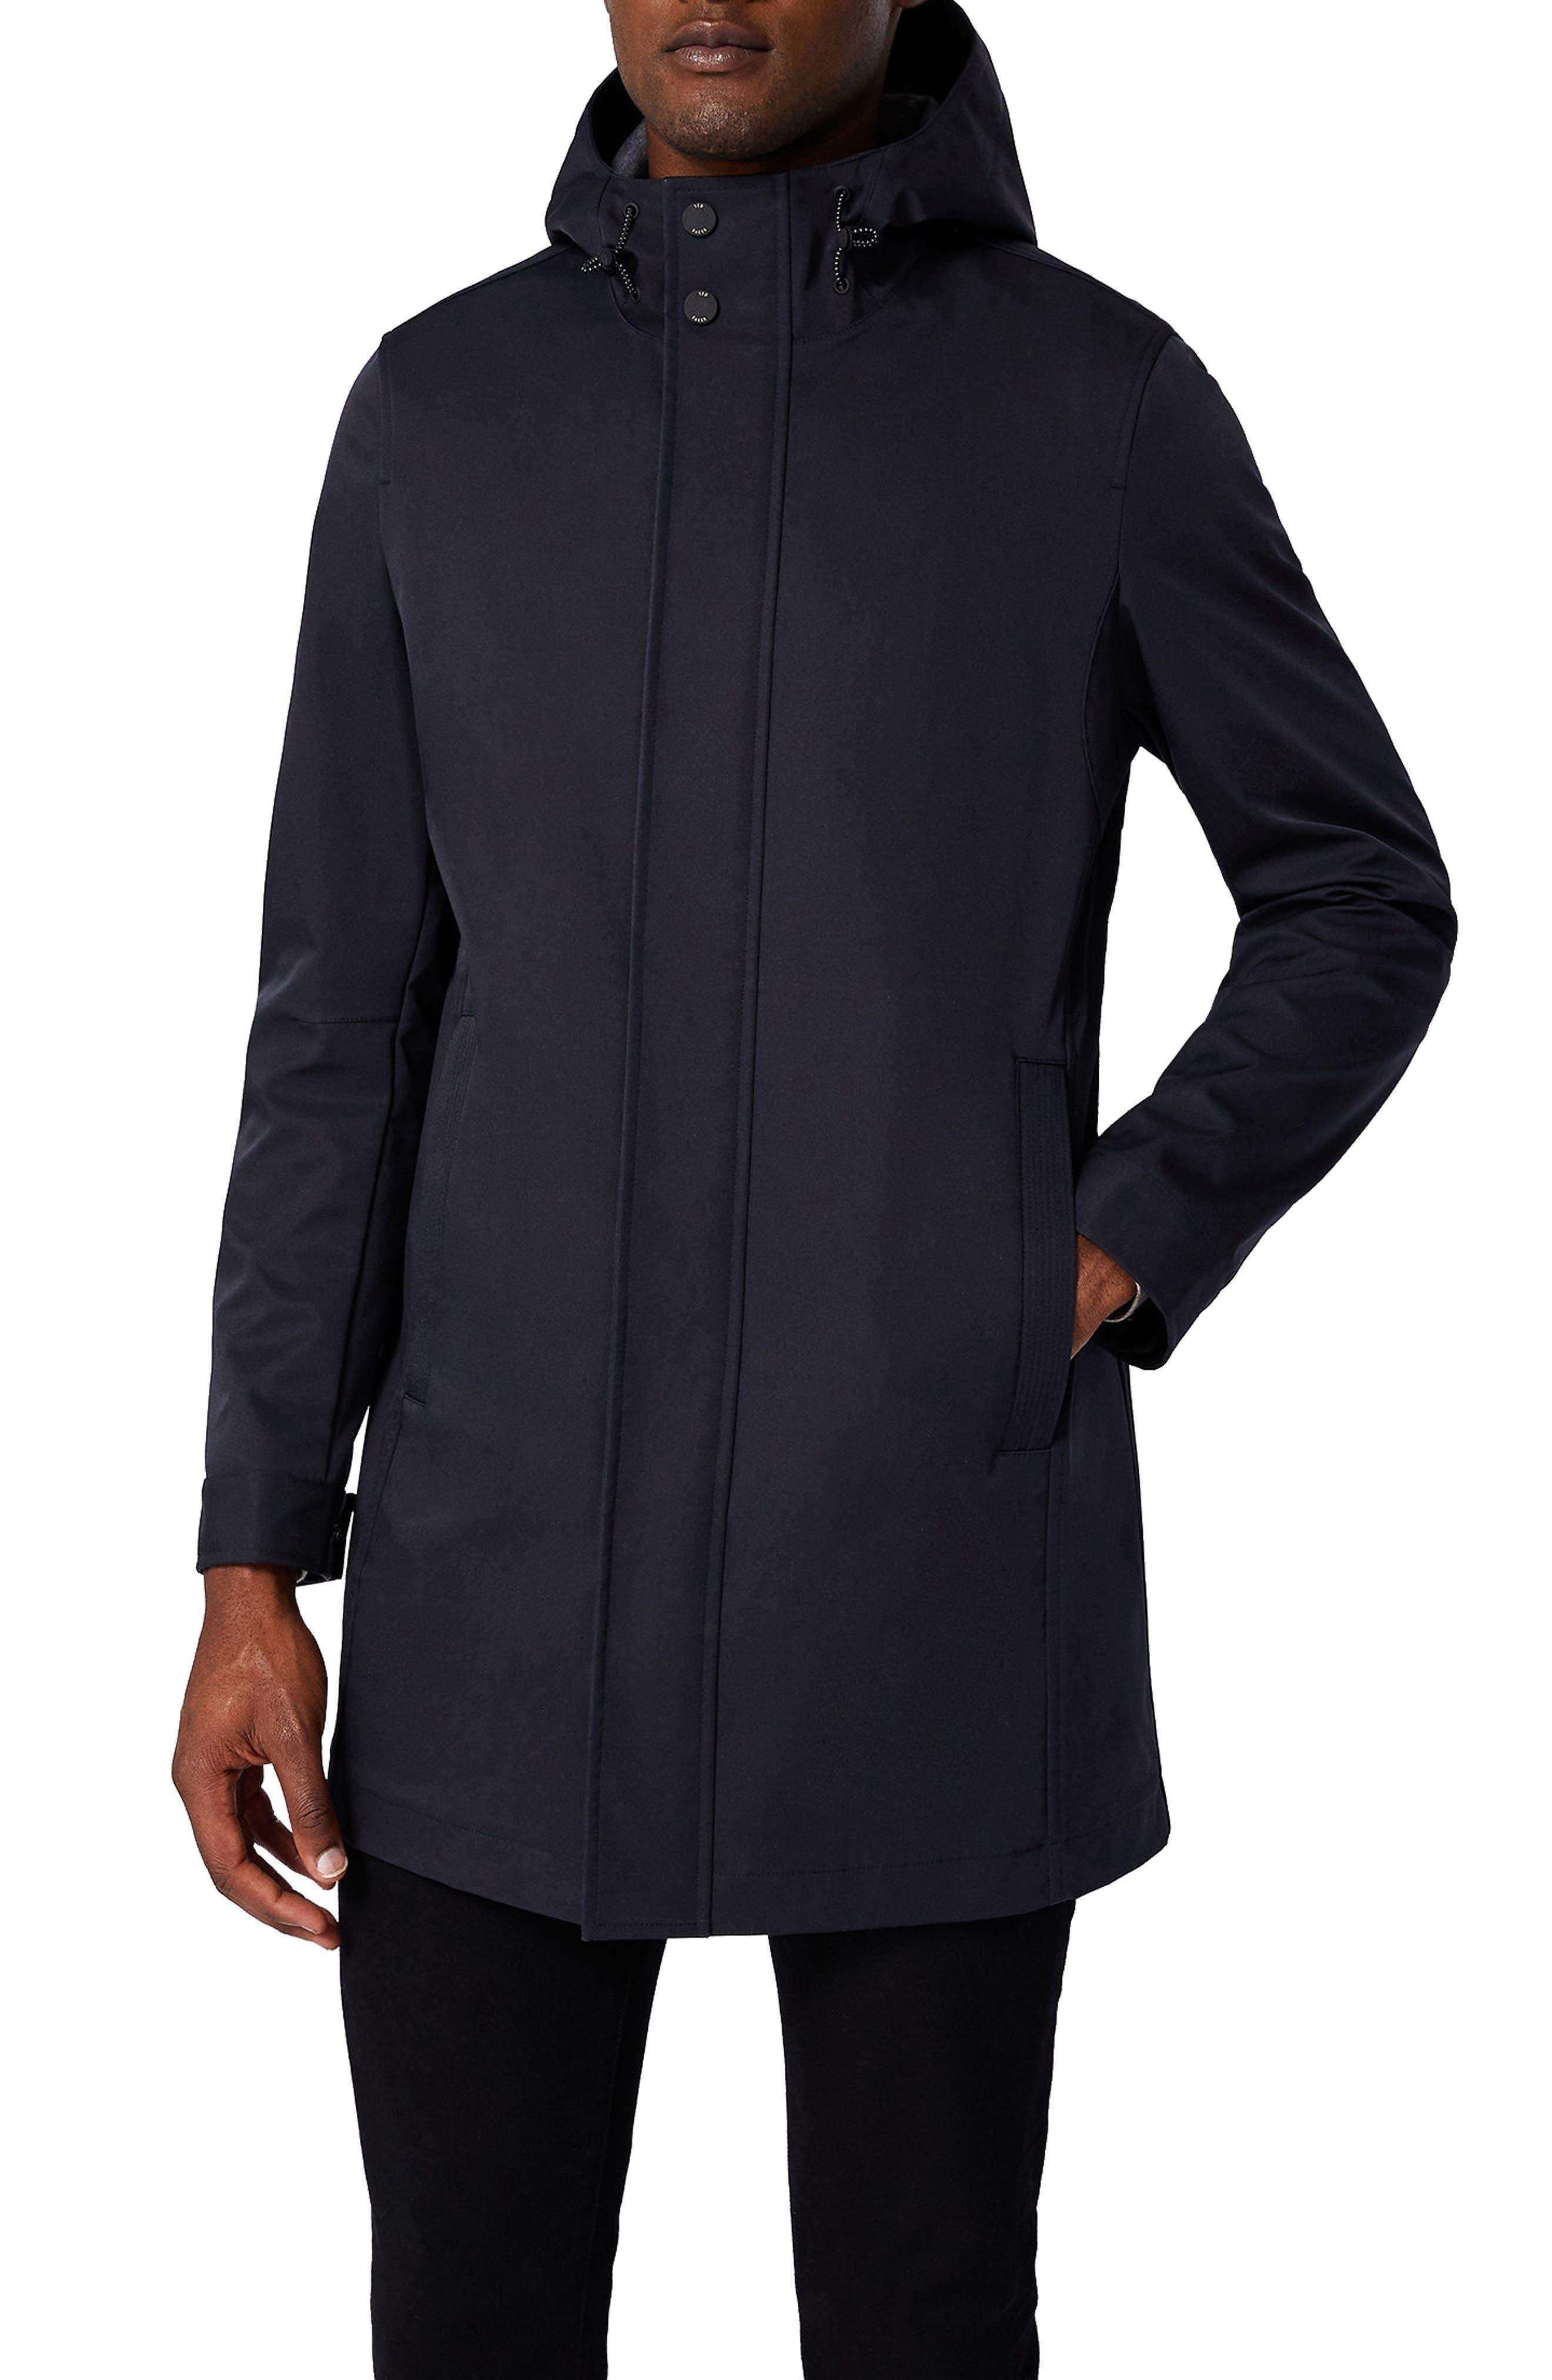 Vernett Hooded Jacket,                             Main thumbnail 1, color,                             410